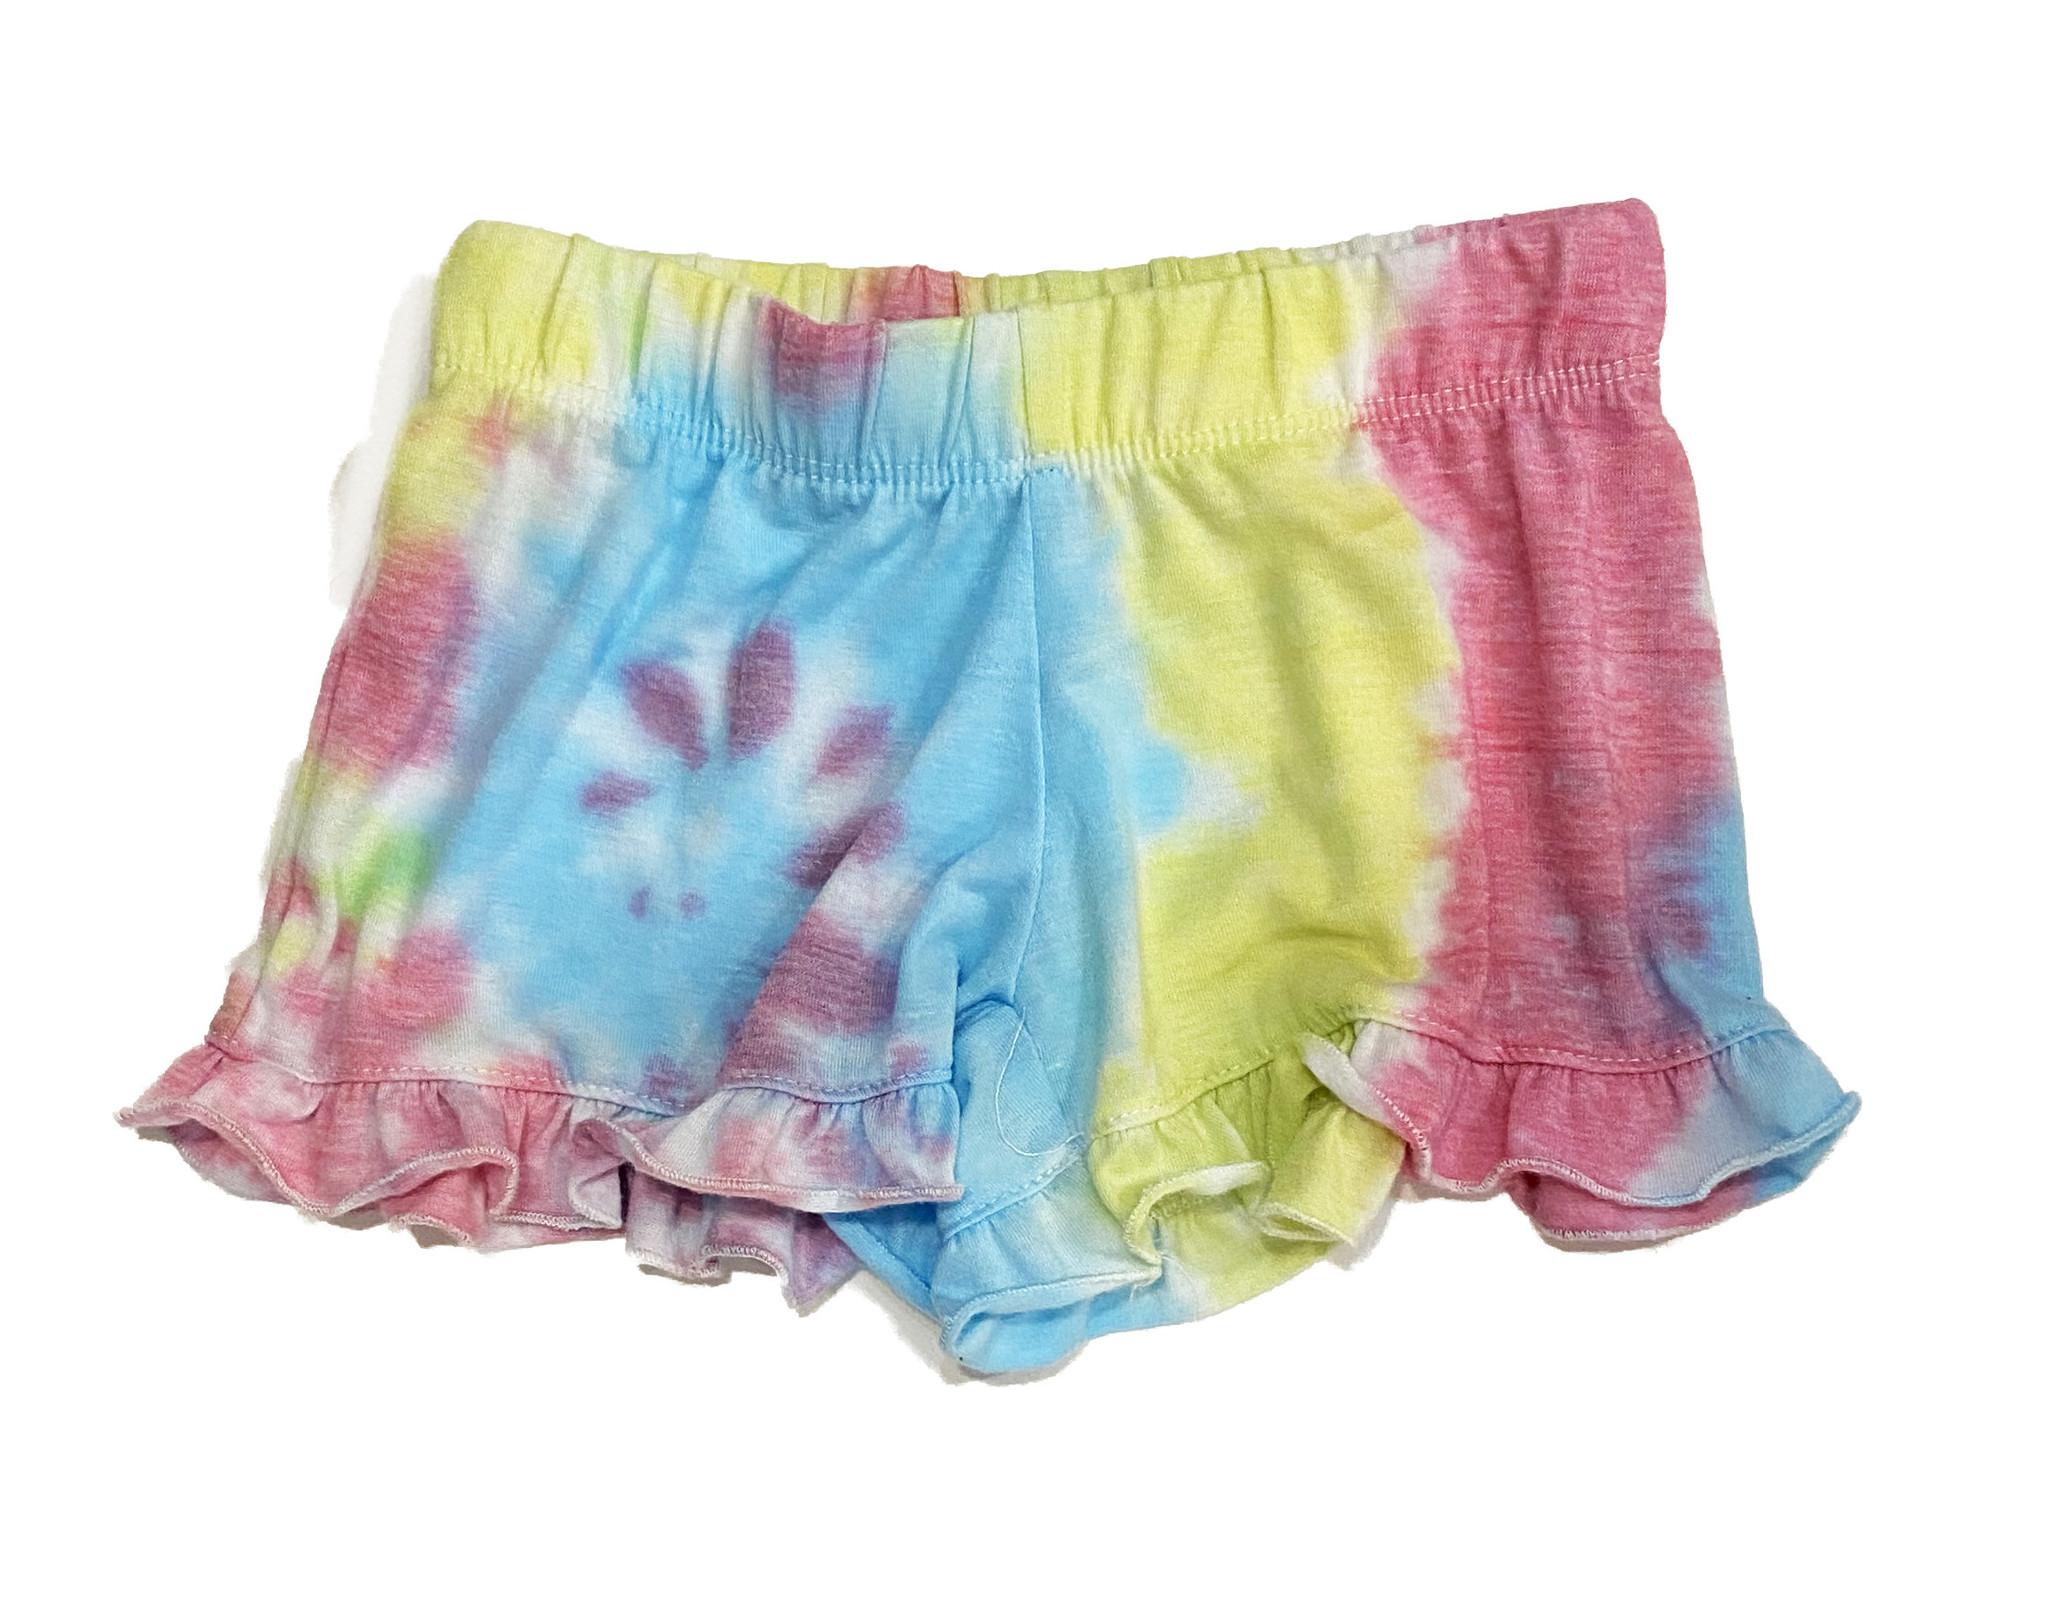 Firehouse Rainbow Swirled Ruffle Shorts